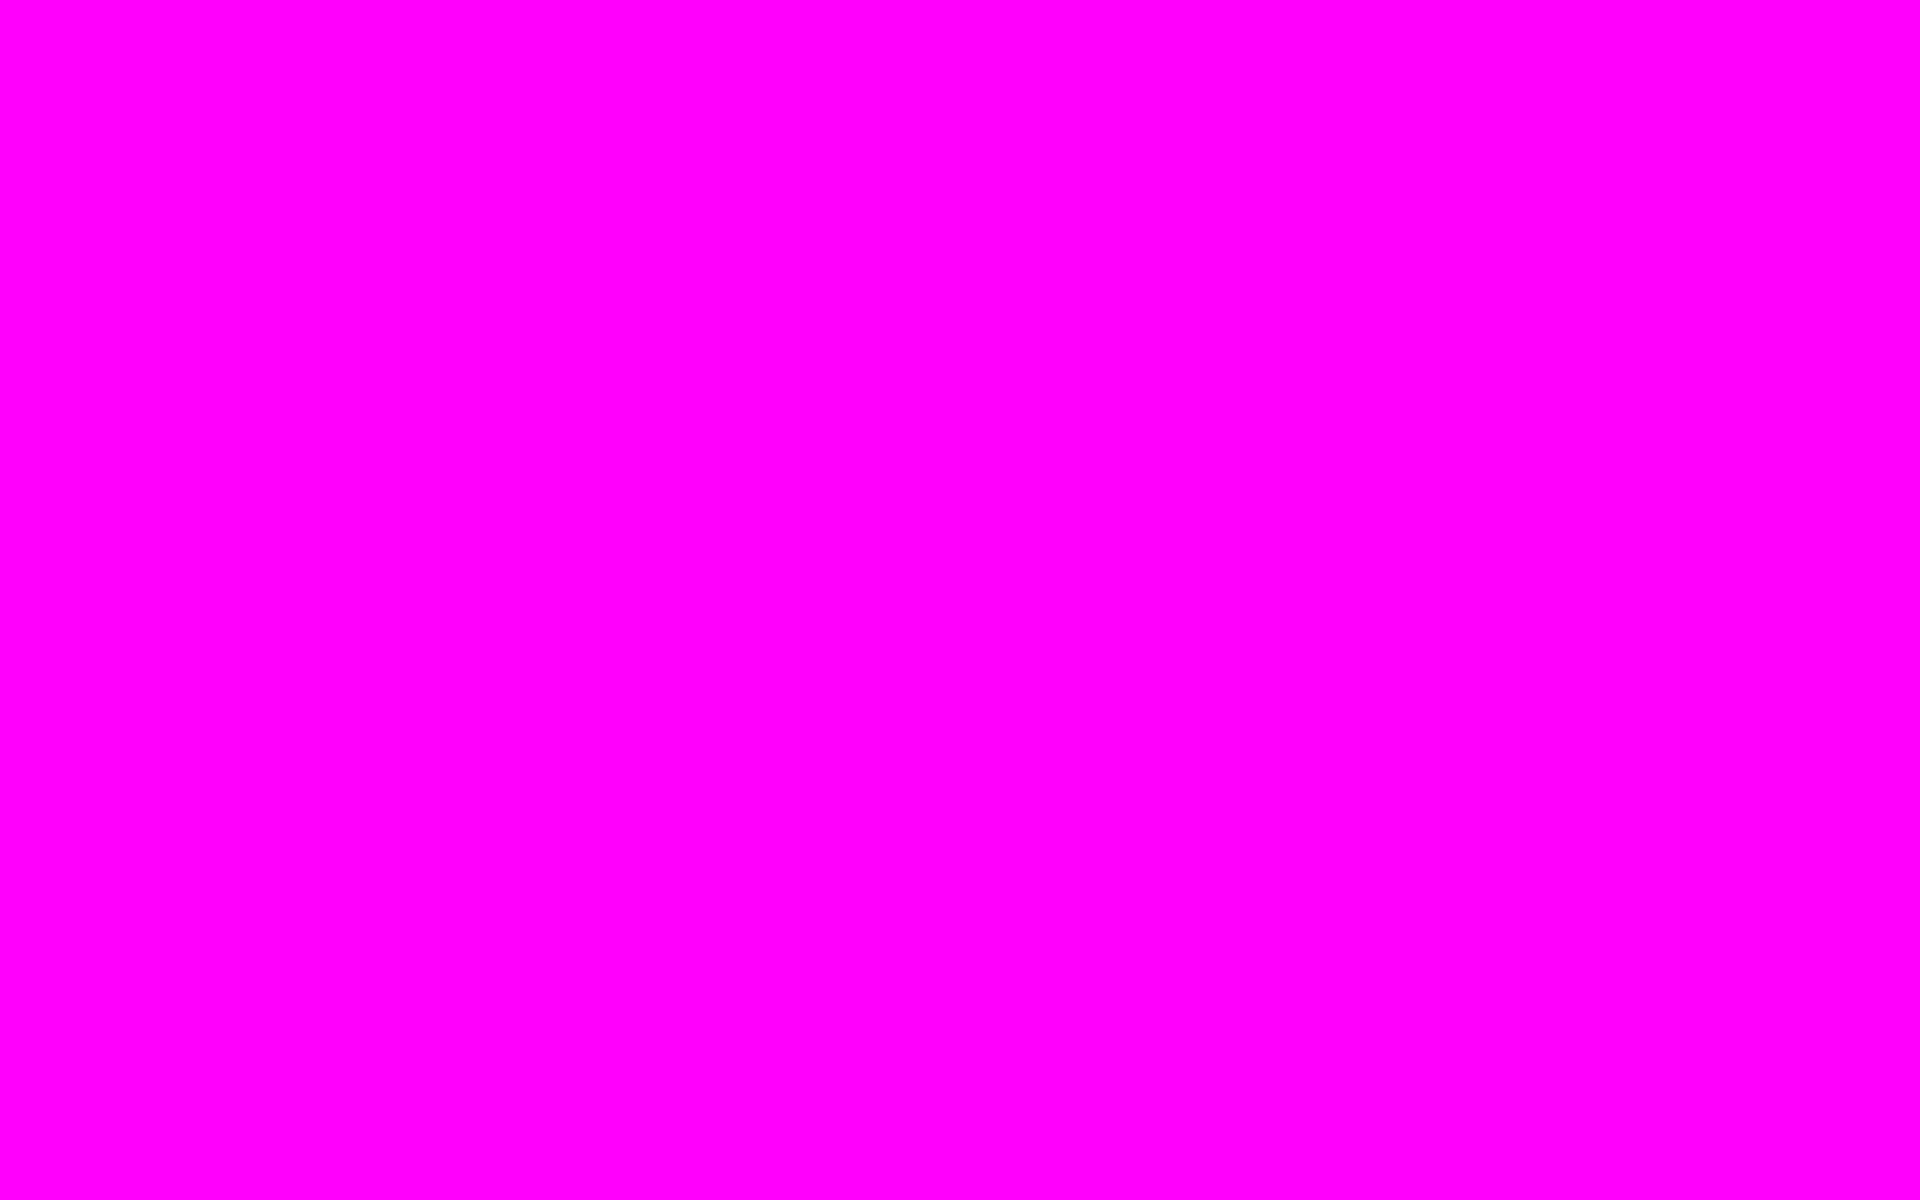 1920x1200 Fuchsia Solid Color Background